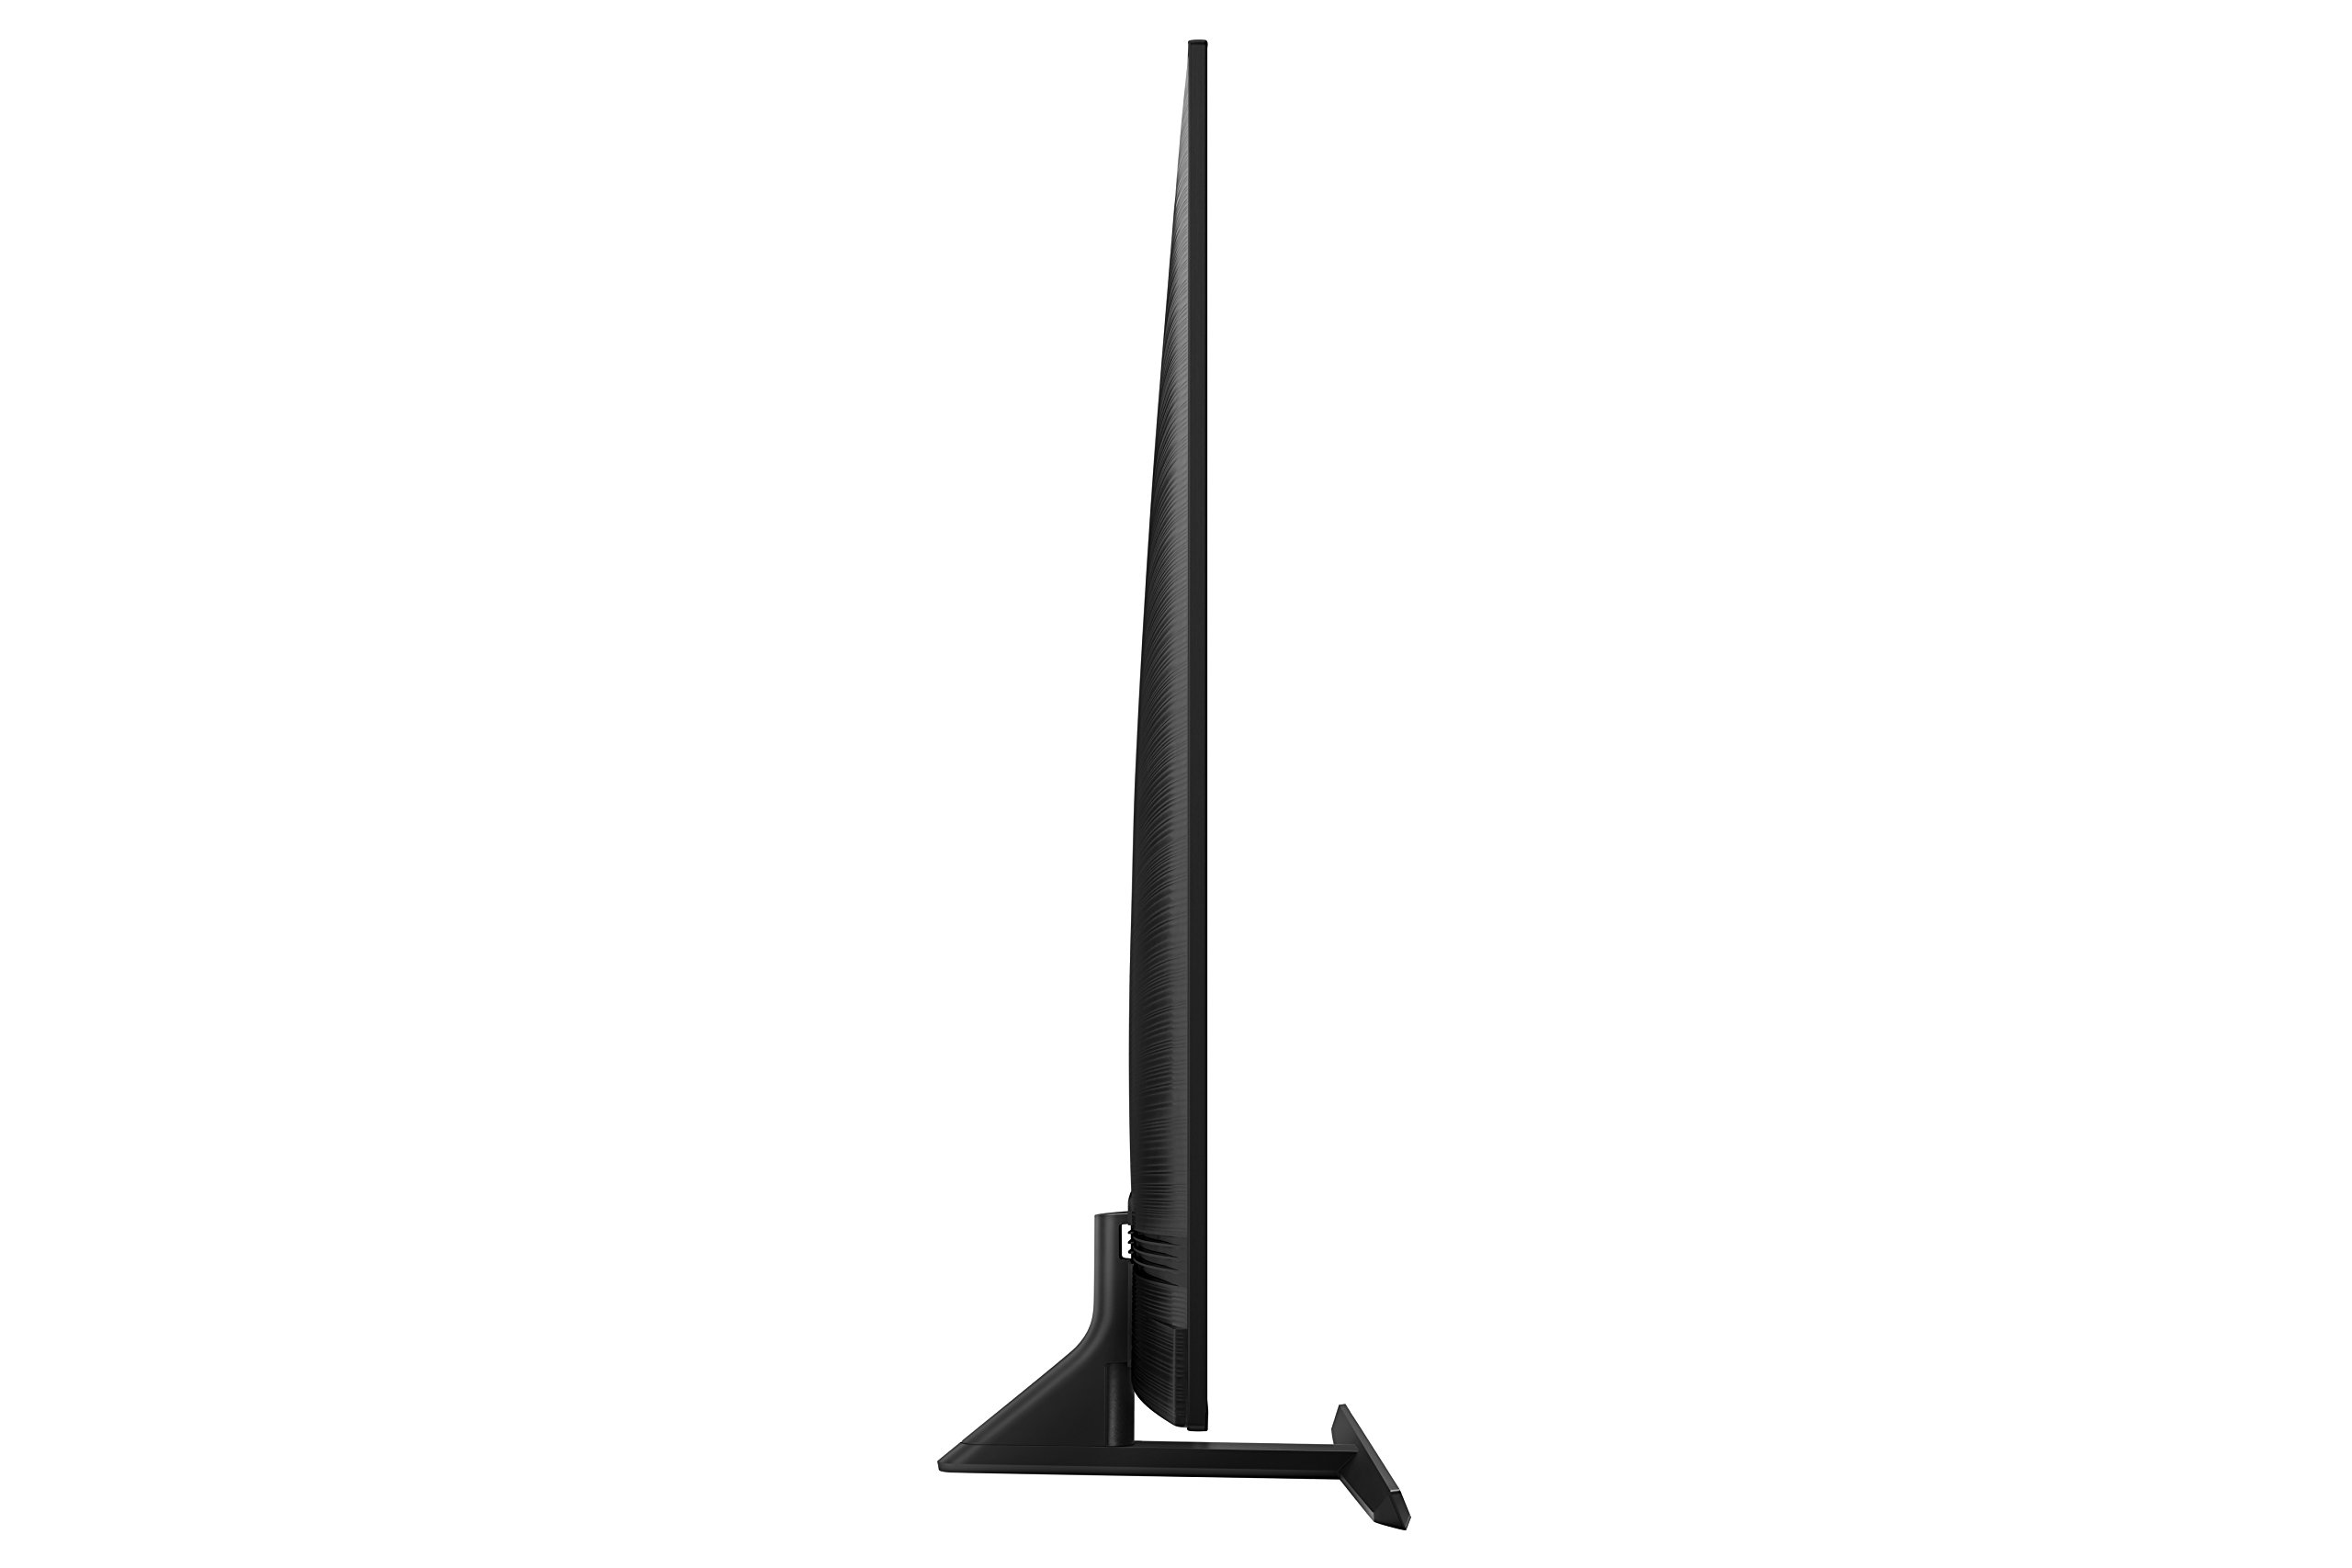 Samsung 4K UHD 8 Series Smart LED TV (2018) 3